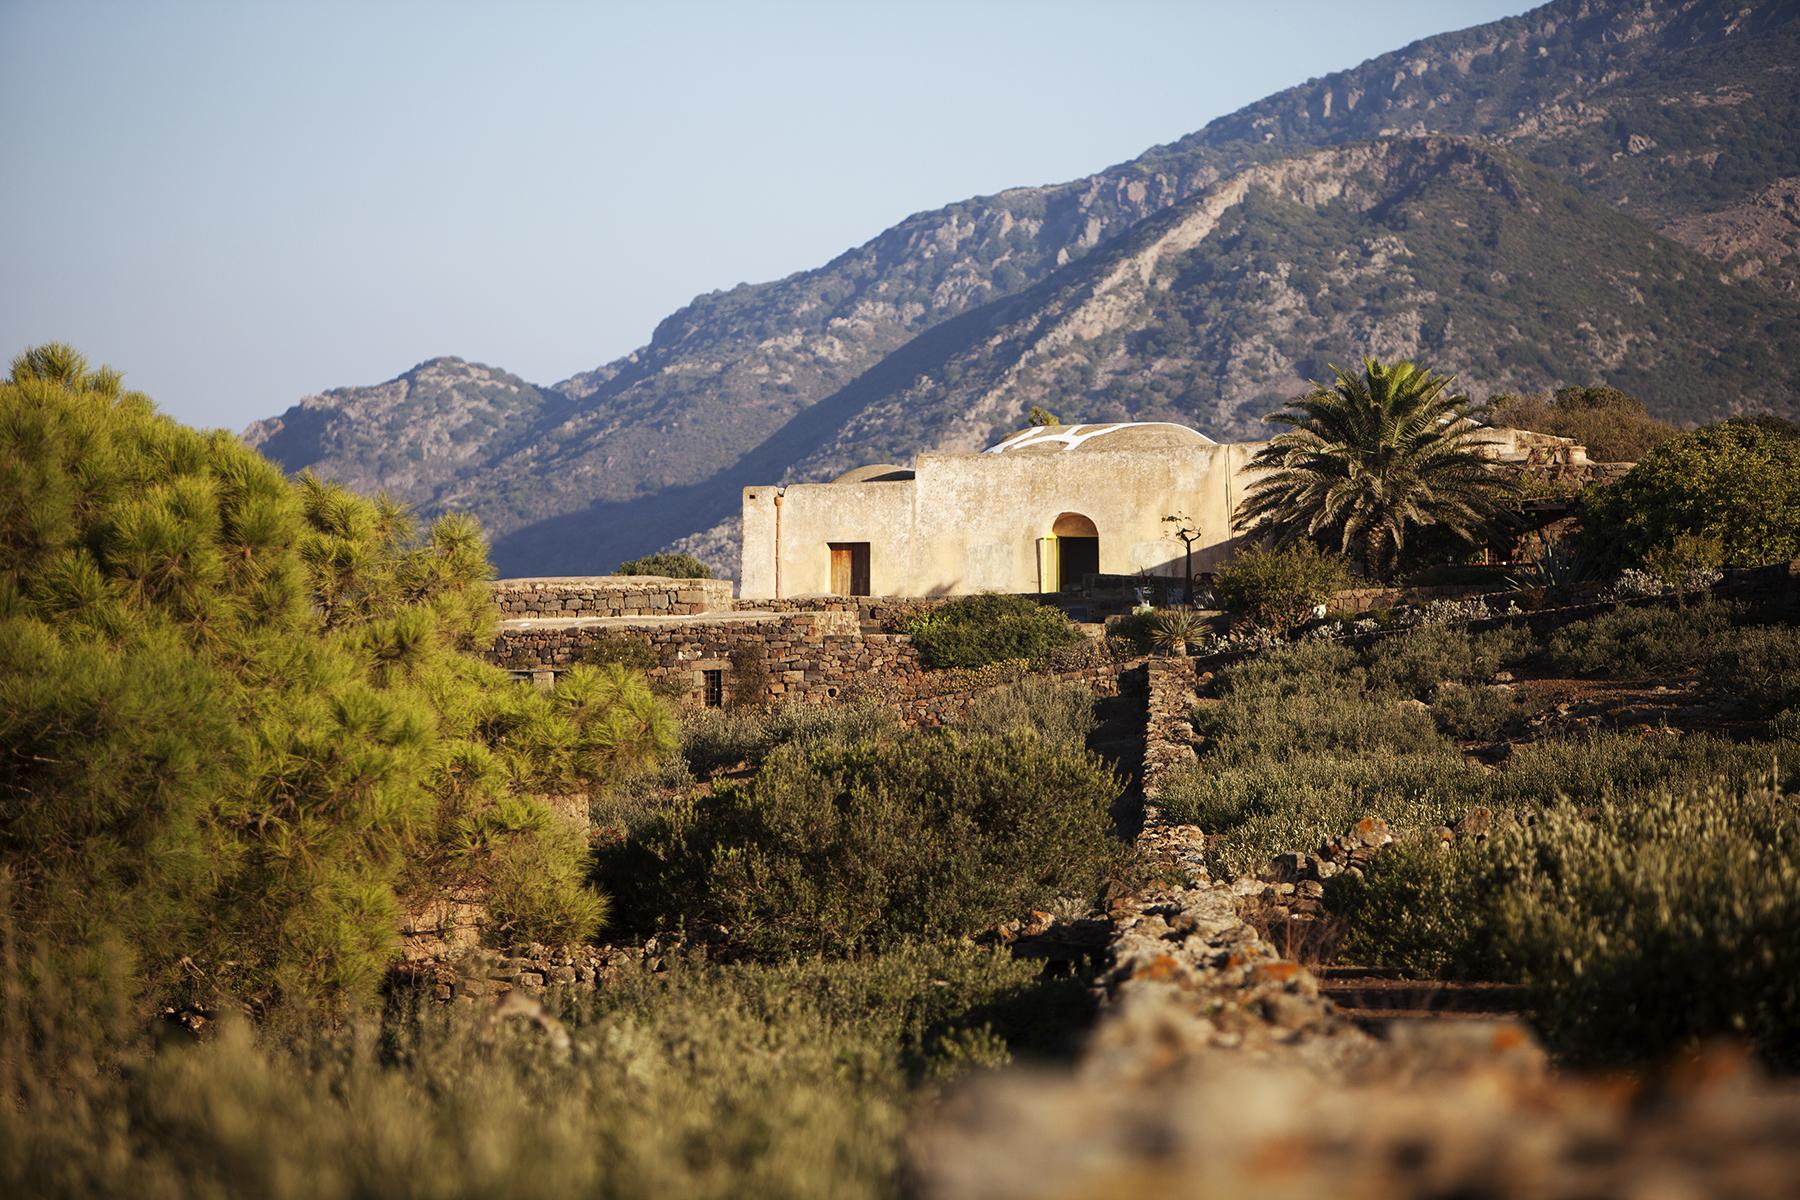 affitta-dammuso-pantelleria-vacanza_01.jpg